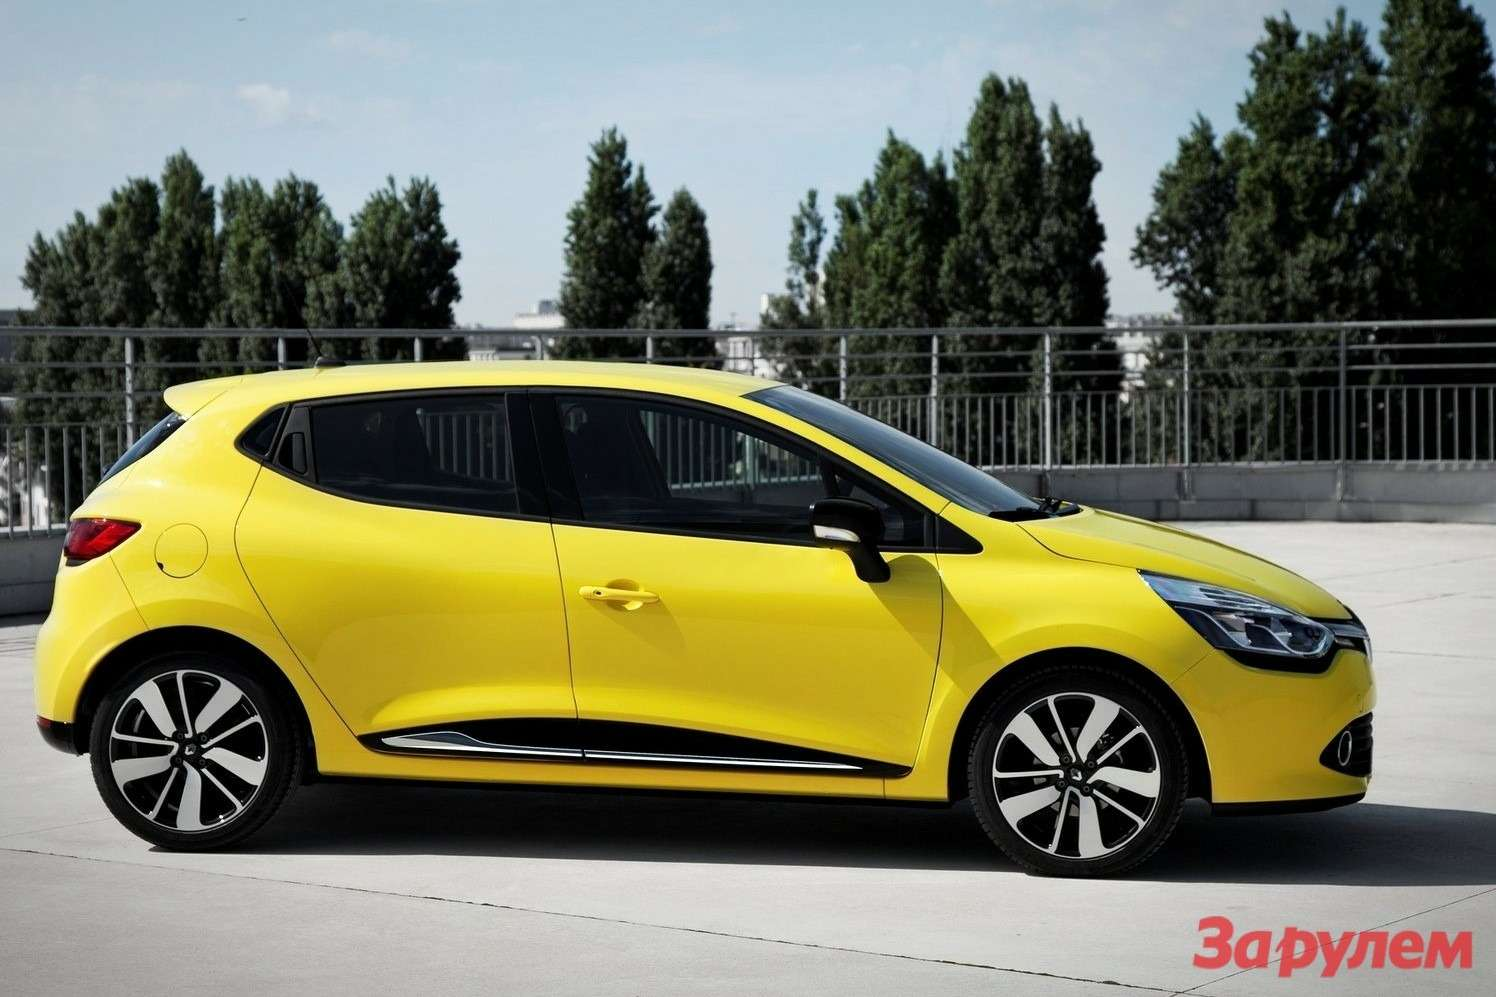 Renault-Clio_2013_1600x1200_wallpaper_07